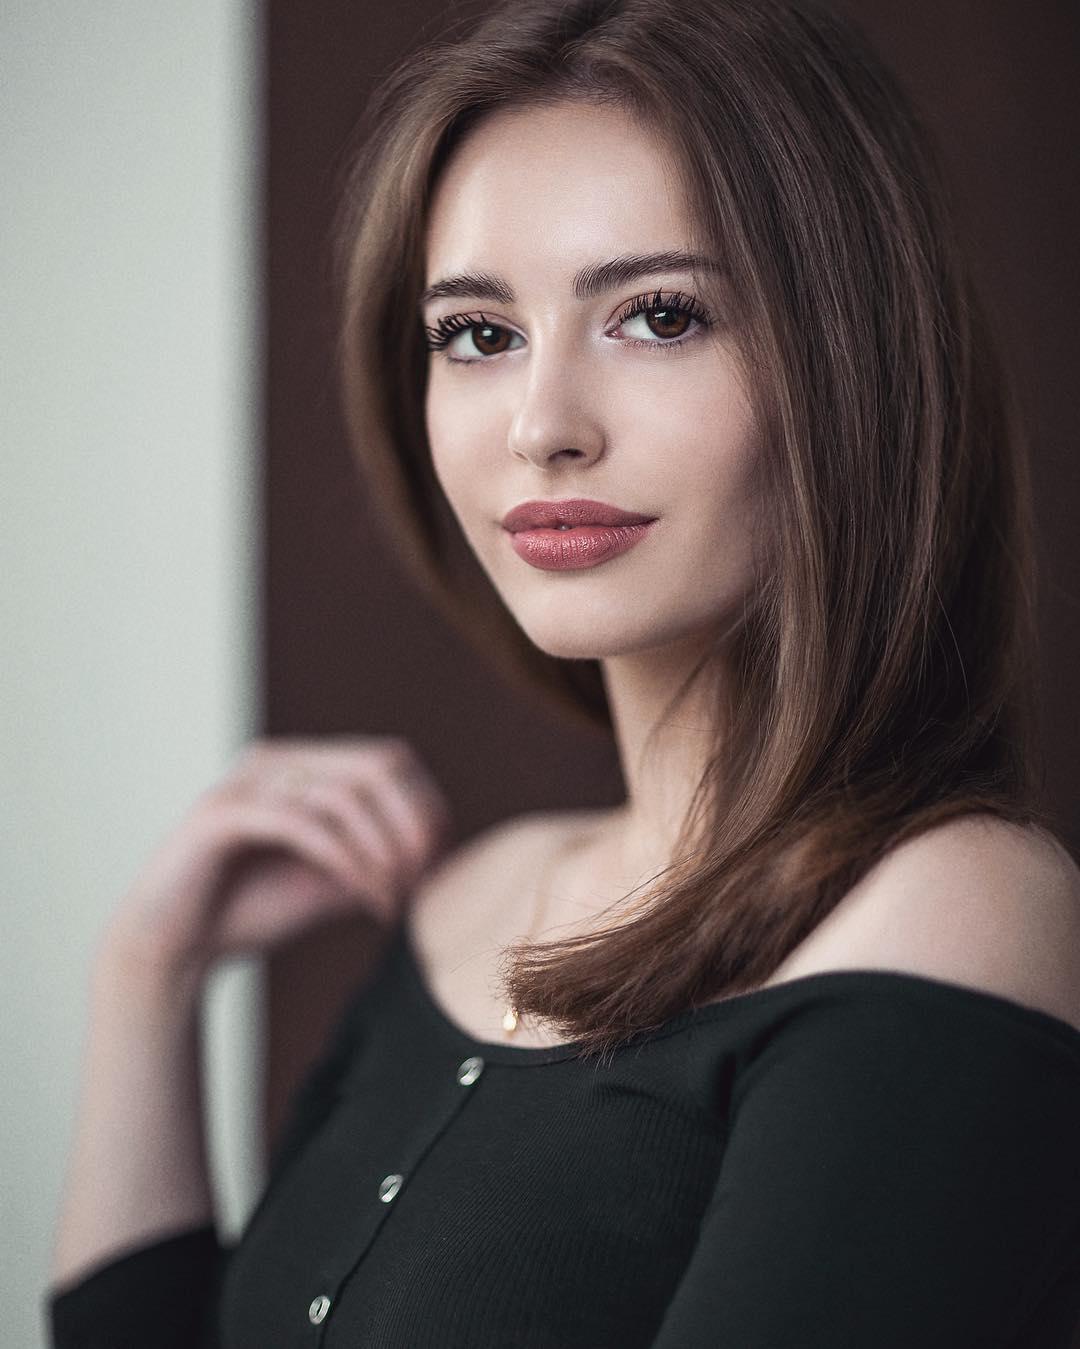 Olga-Seliverstova-Wallpapers-Insta-Fit-Bio-4